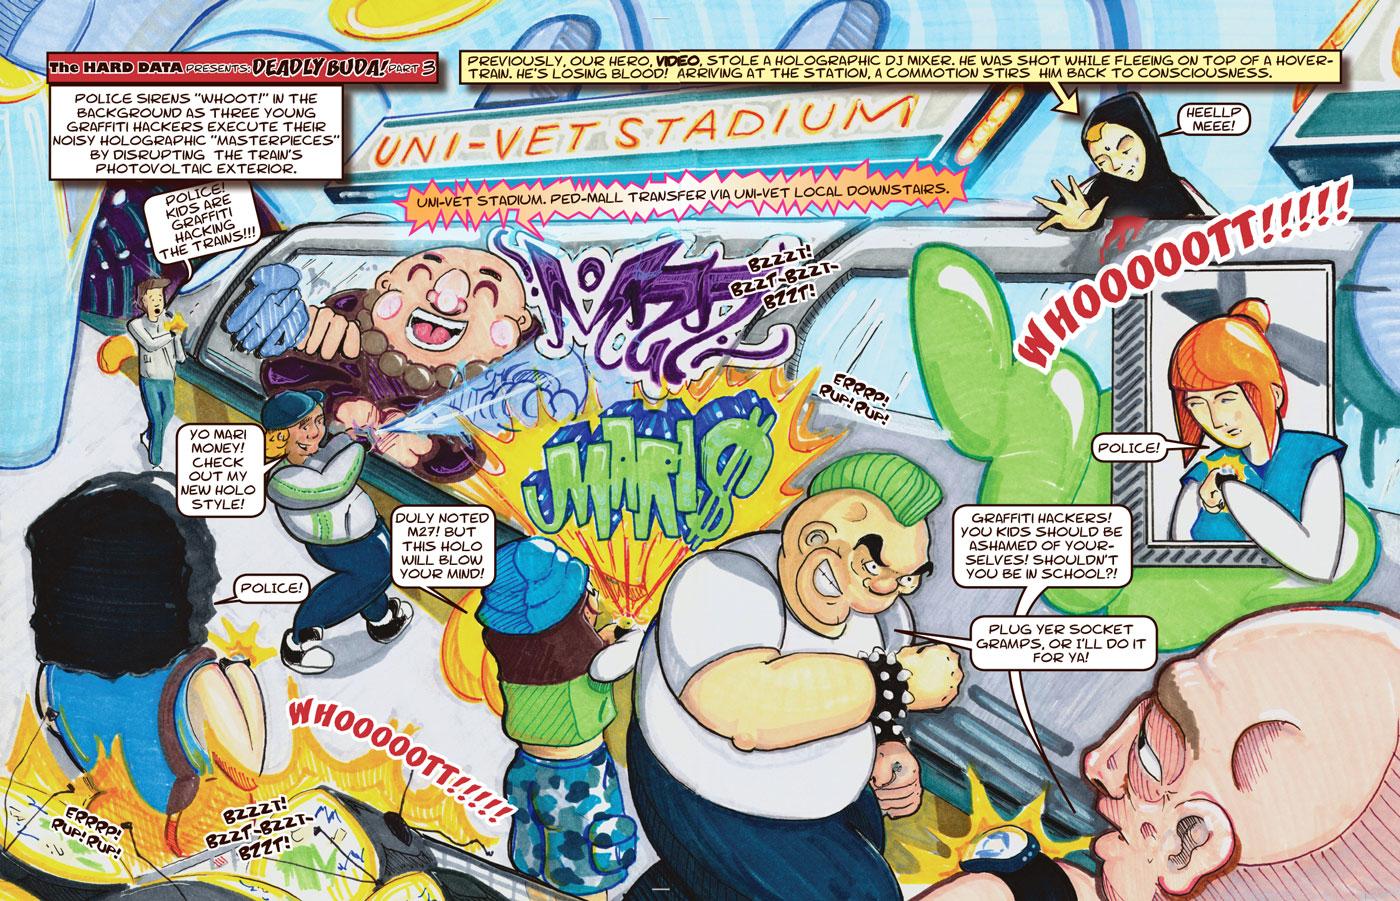 deadly buda rave comics part 3 the hard data